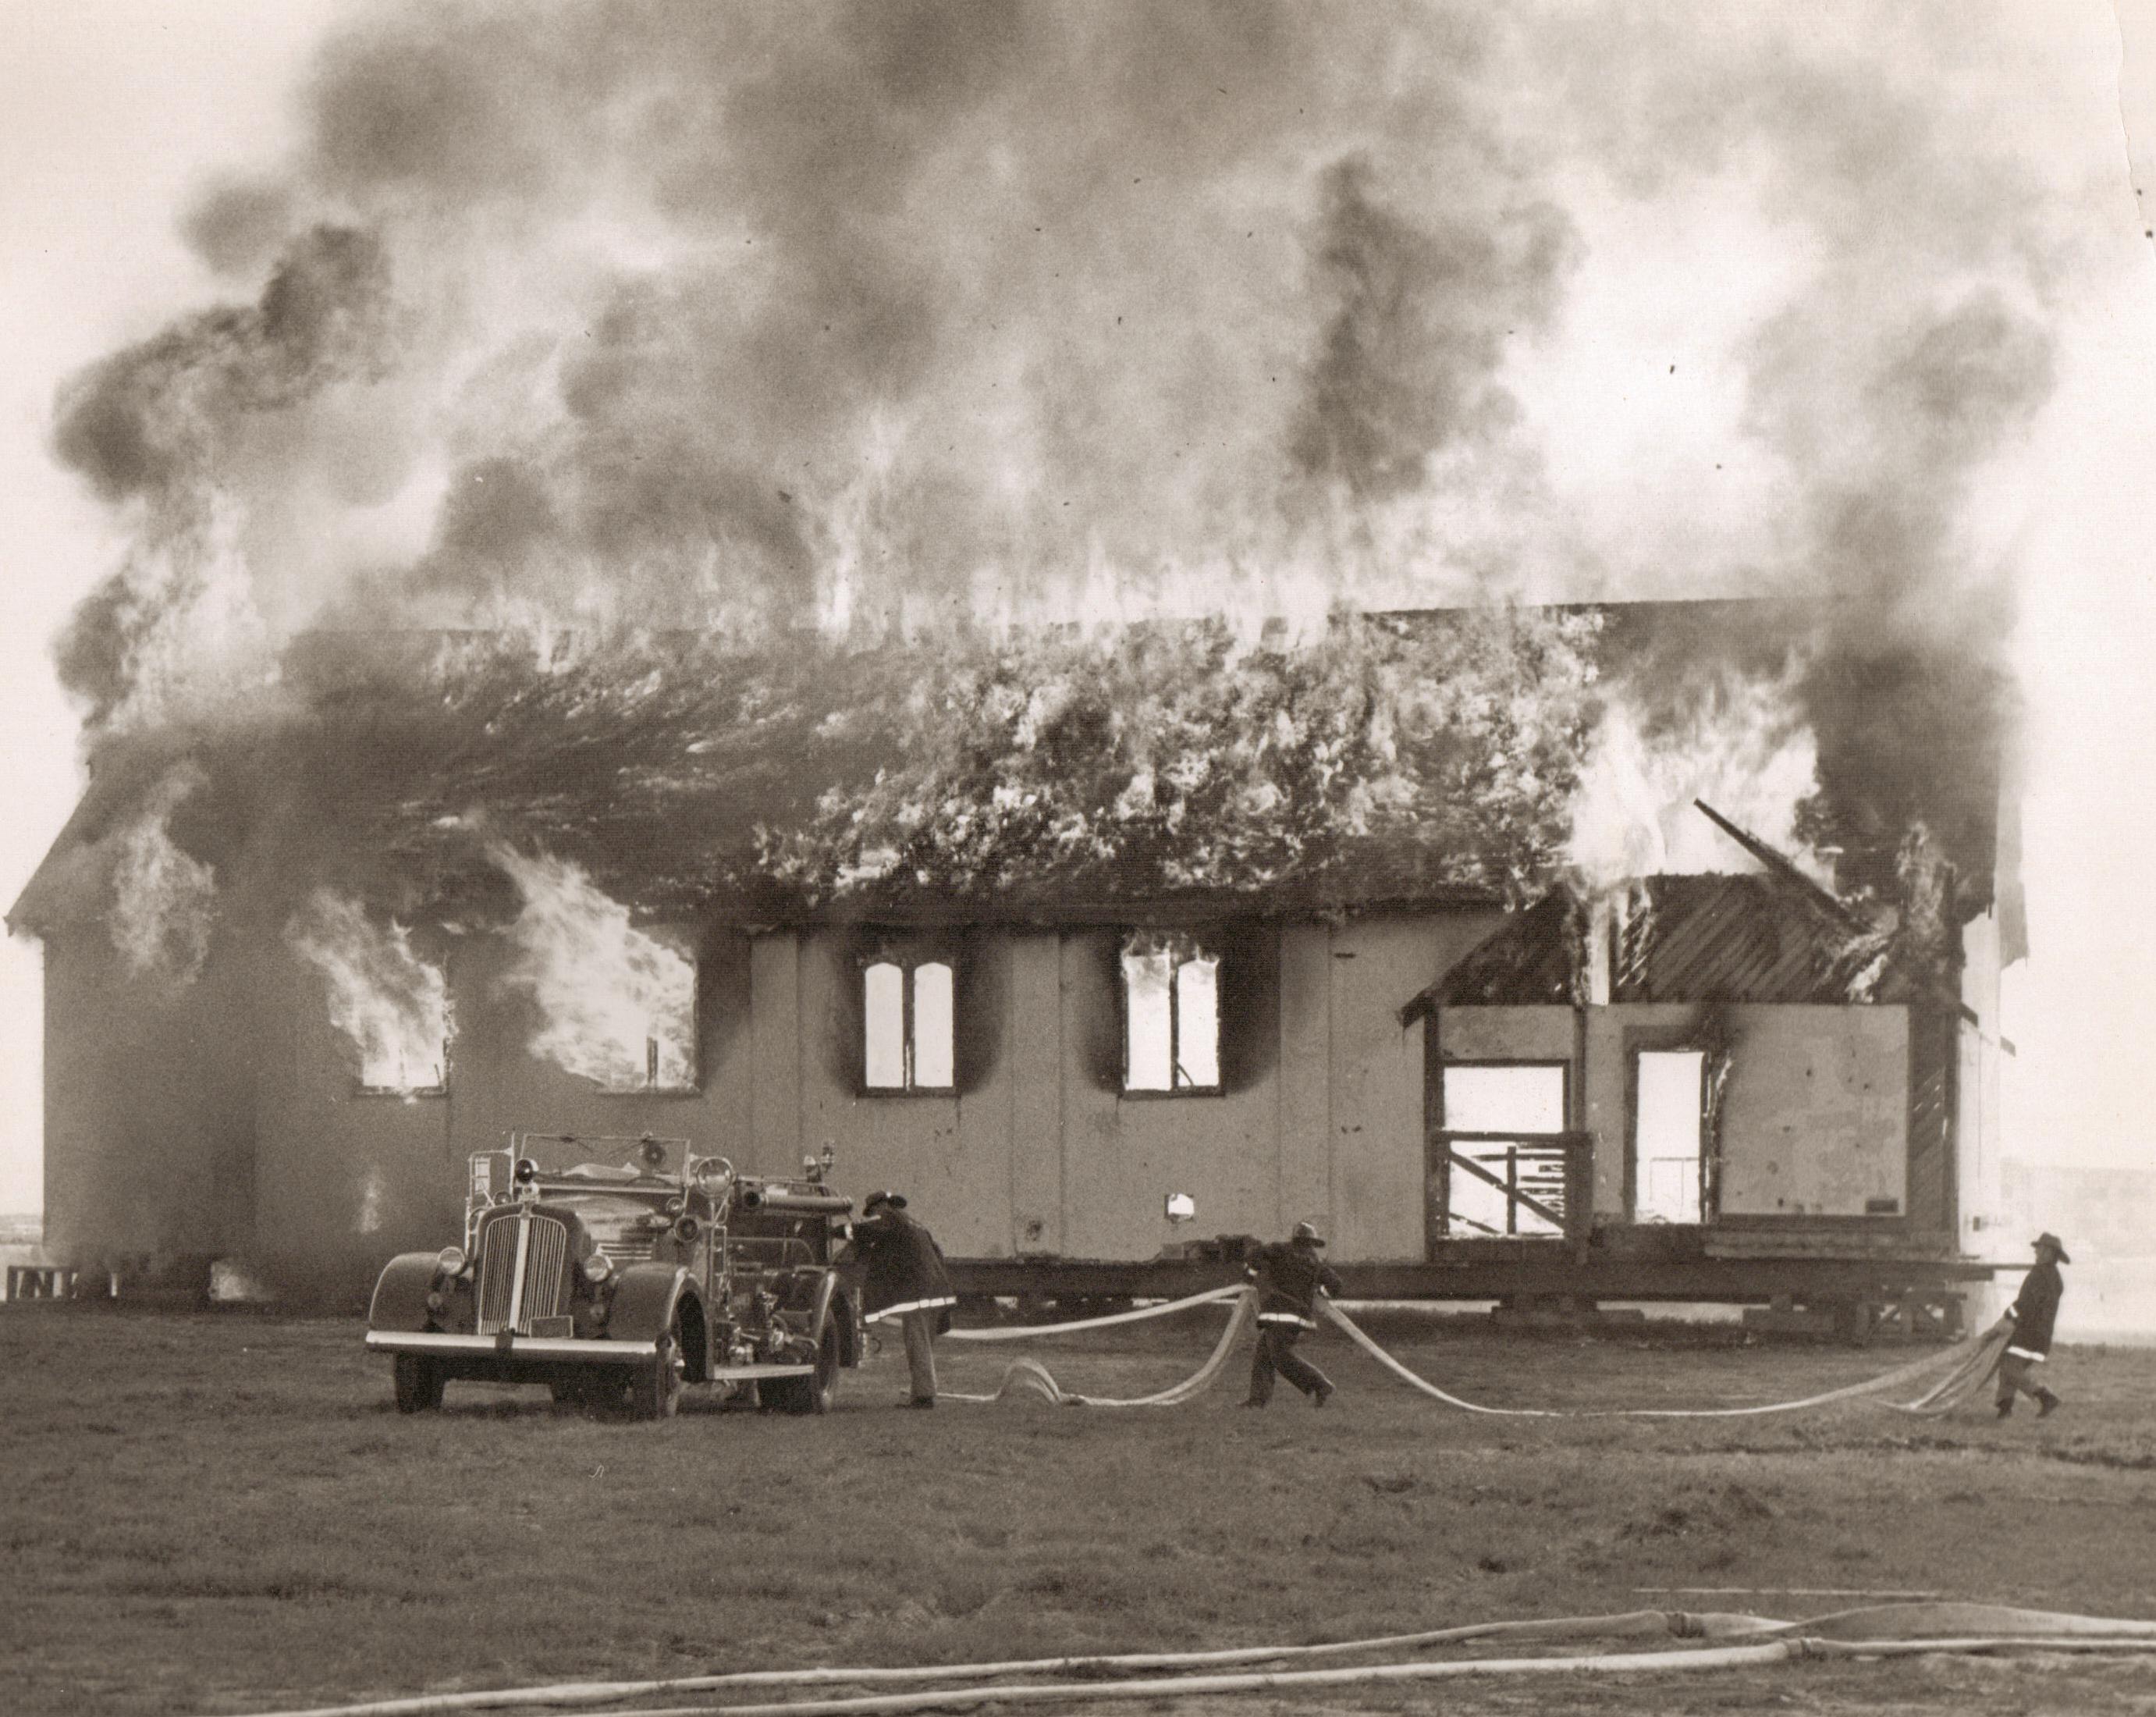 St. Mark's Training Burn